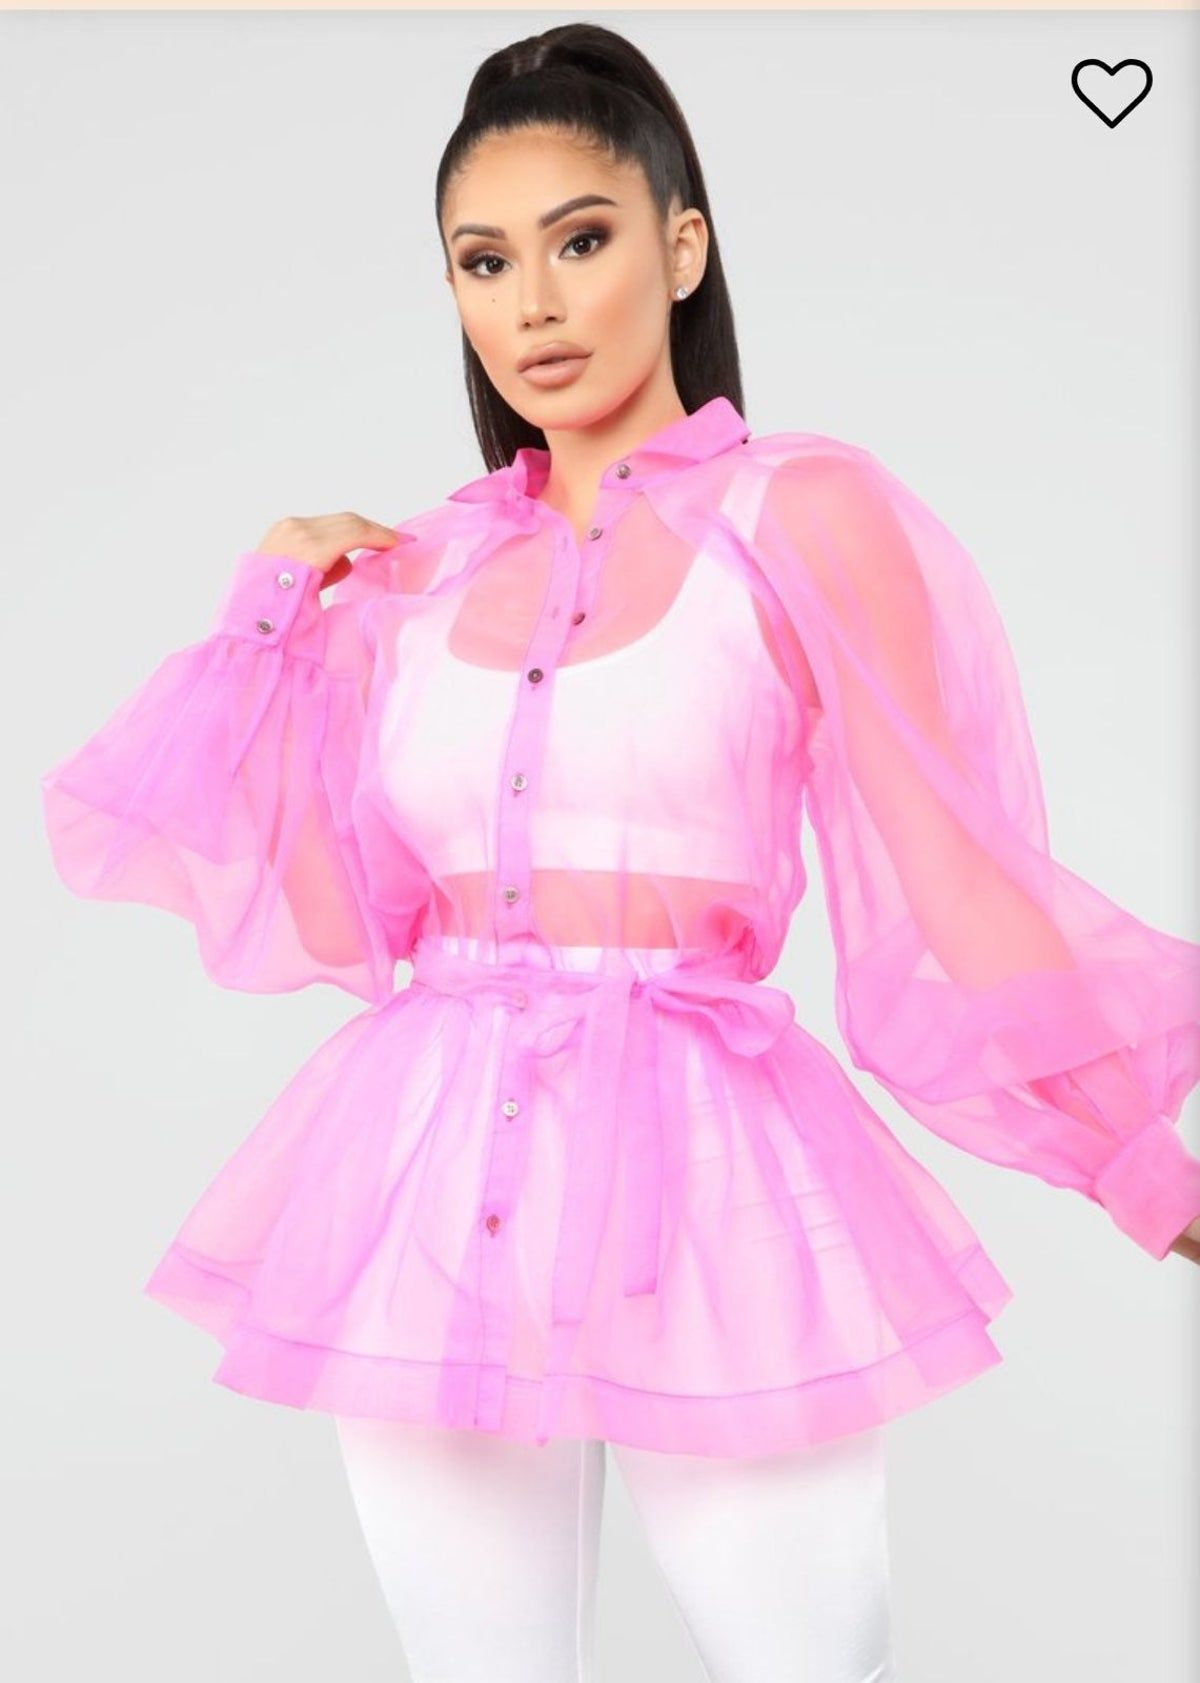 Bright Pink Fashion Nova Sheer Jacket in 2020 Fashion